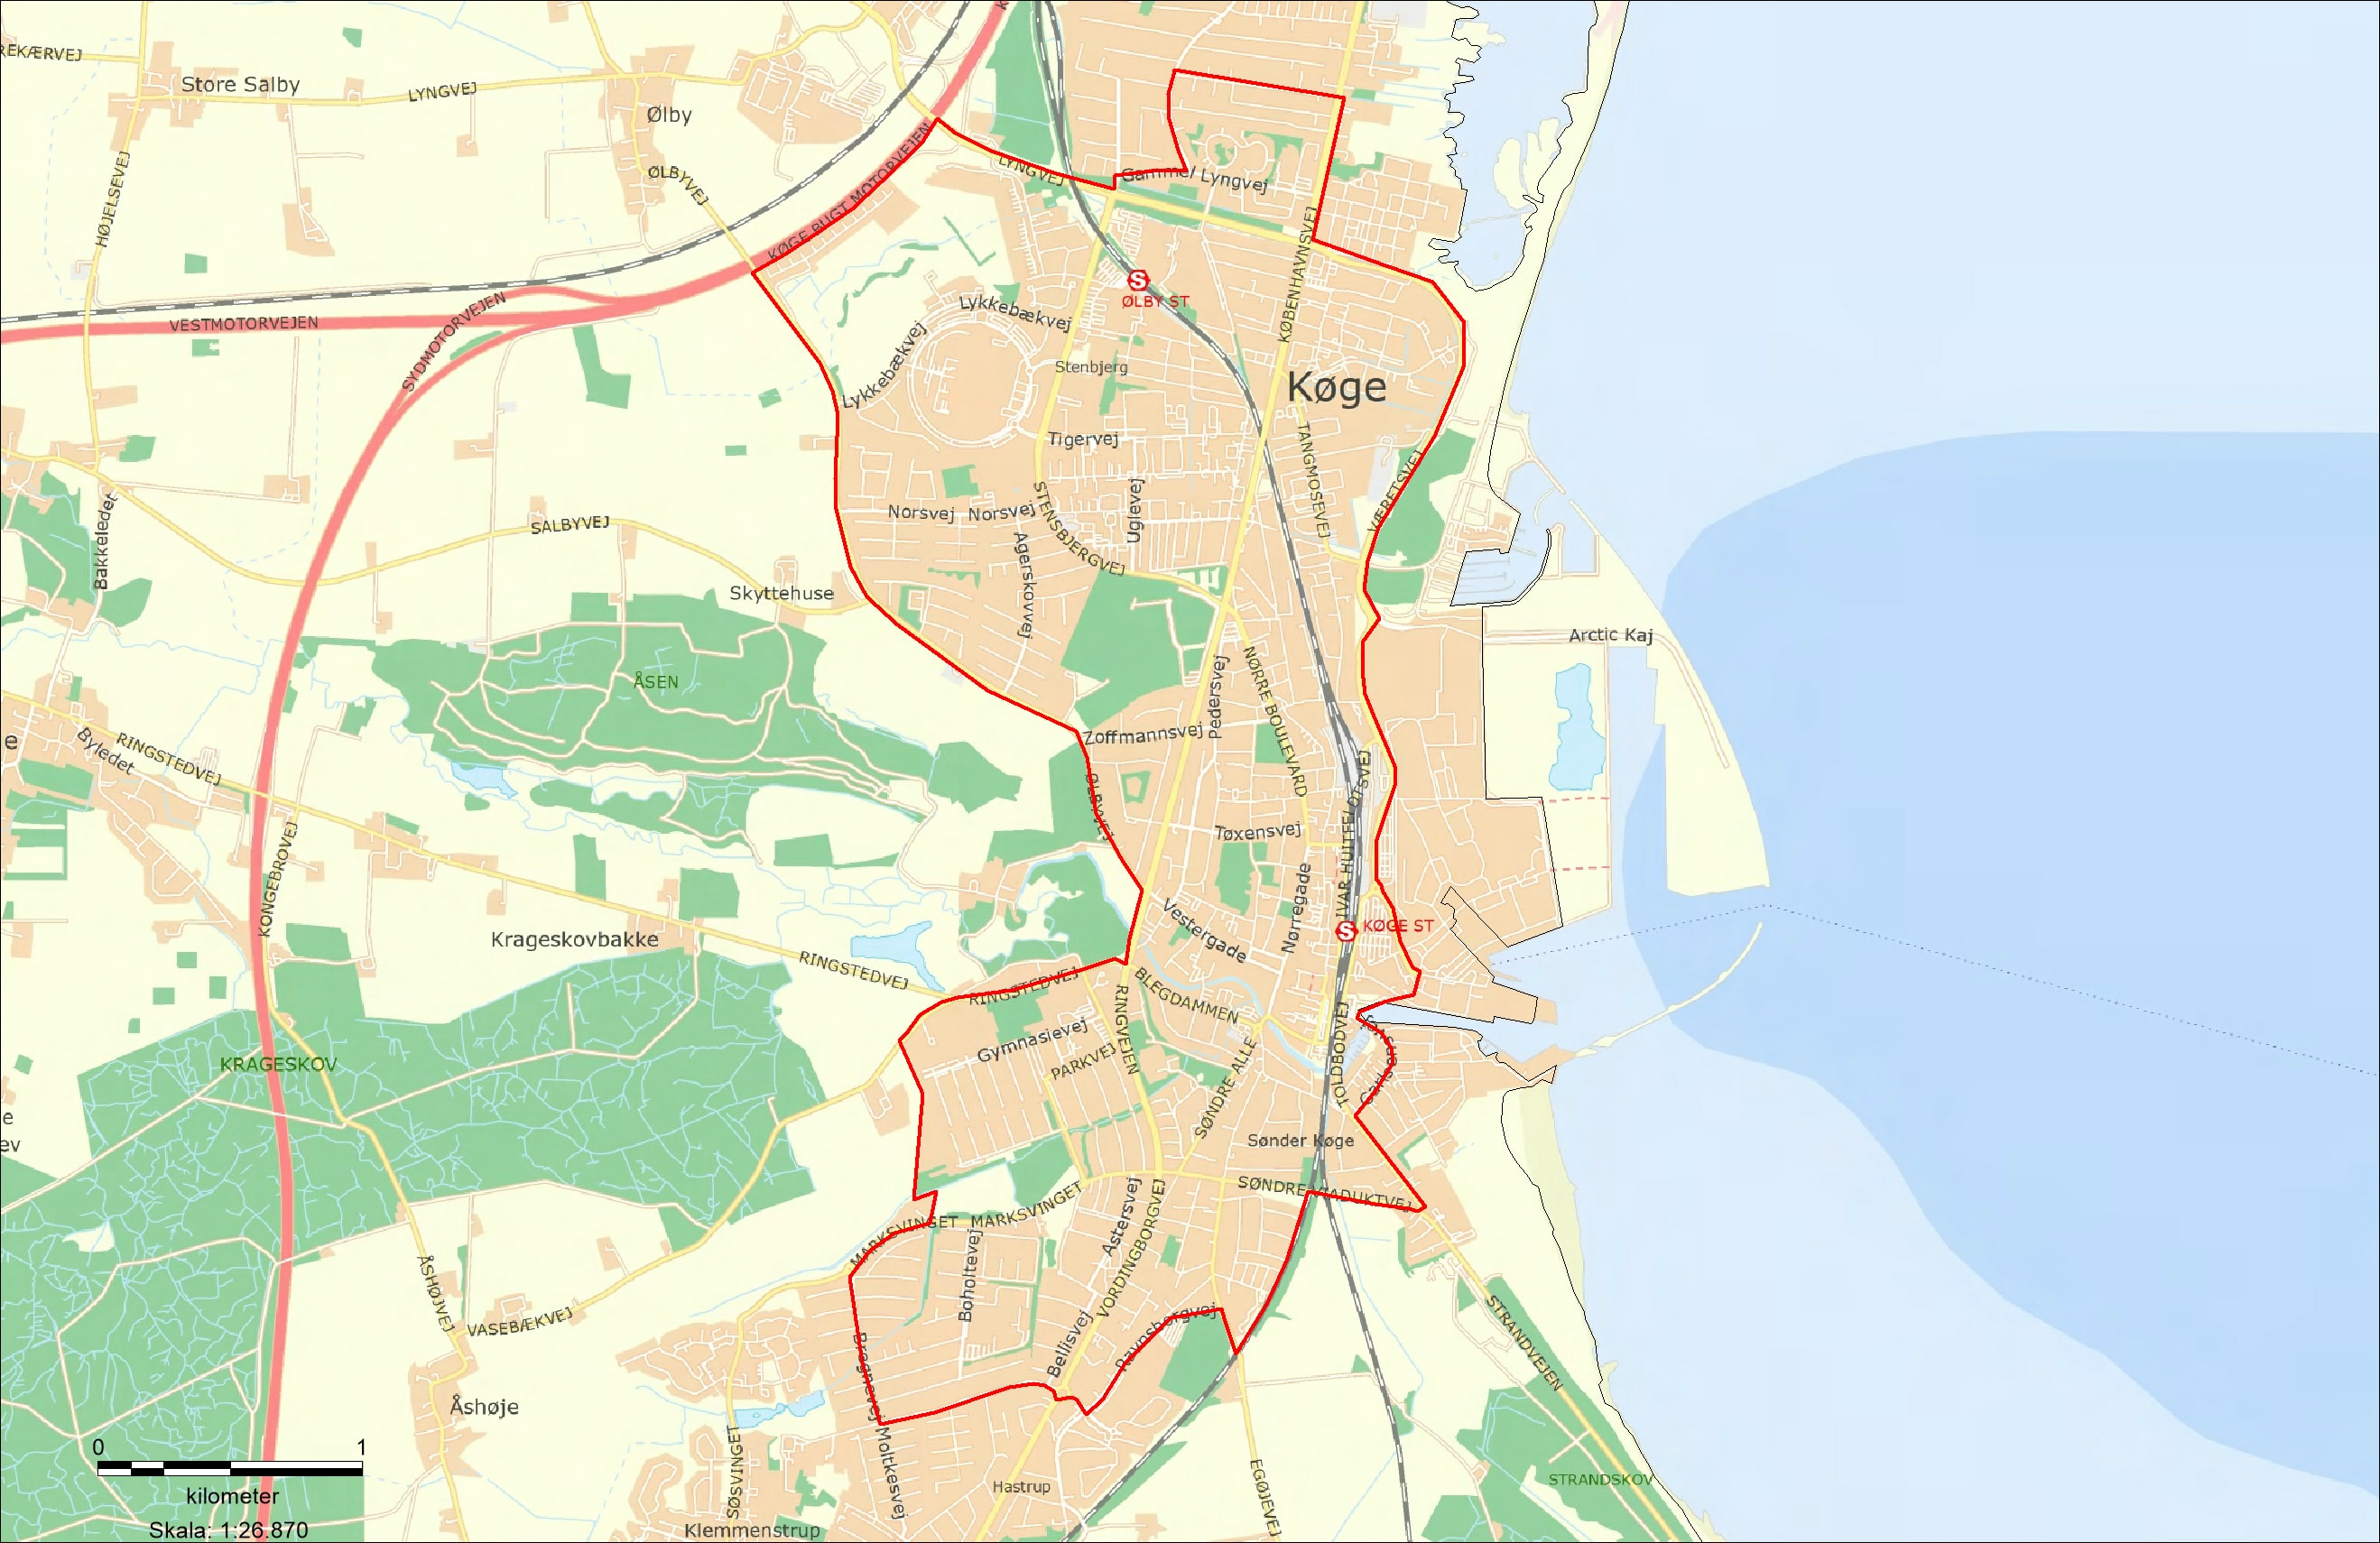 Visitationszone Køge